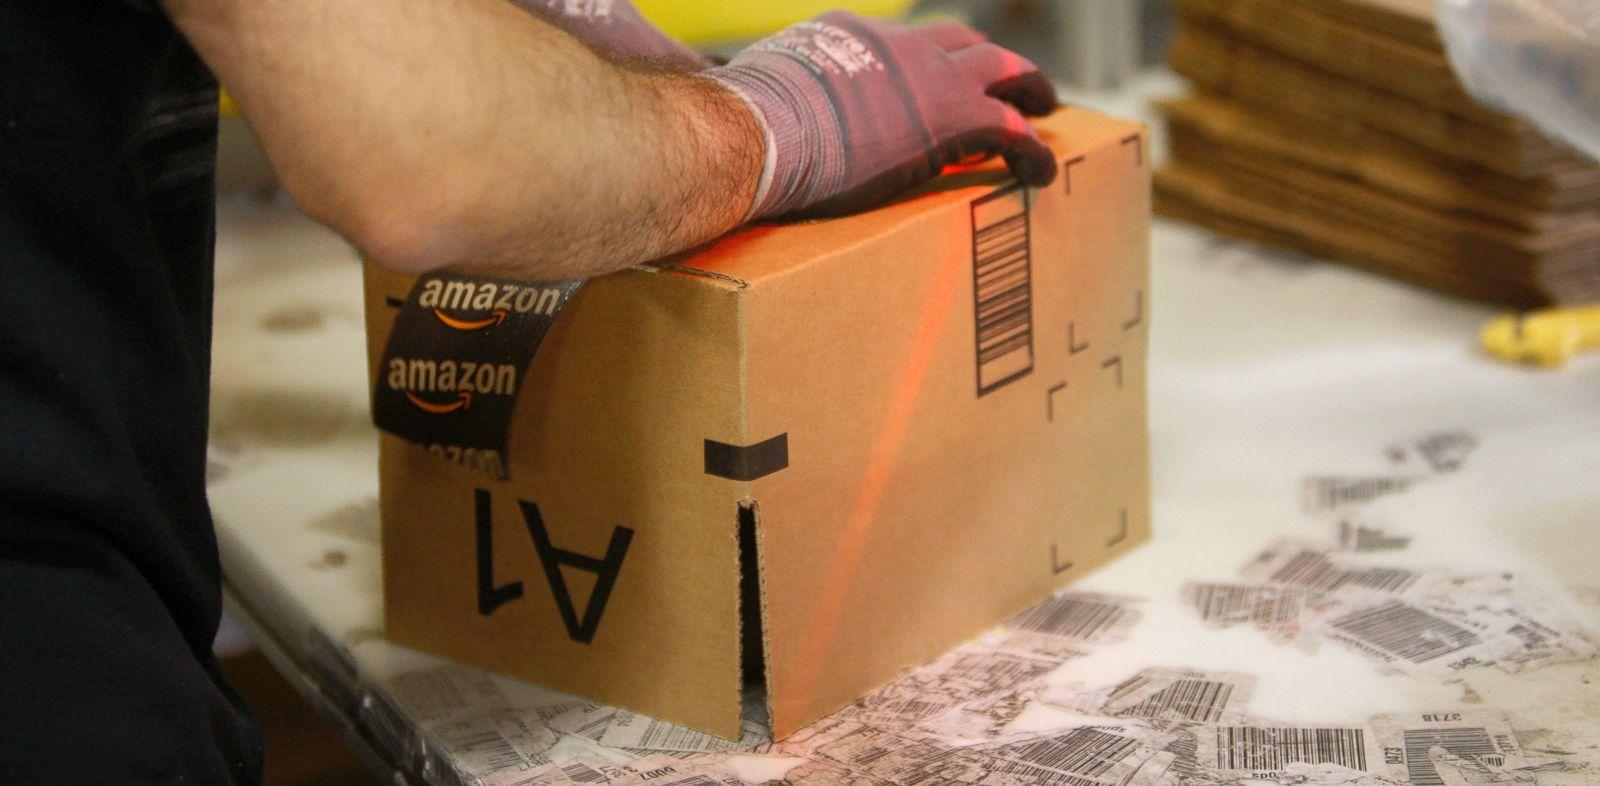 PHOTO: An employee ships packages from the Amazon San Bernardino Fulfillment Center, Oct. 29, 2013, in San Bernardino, Calif.